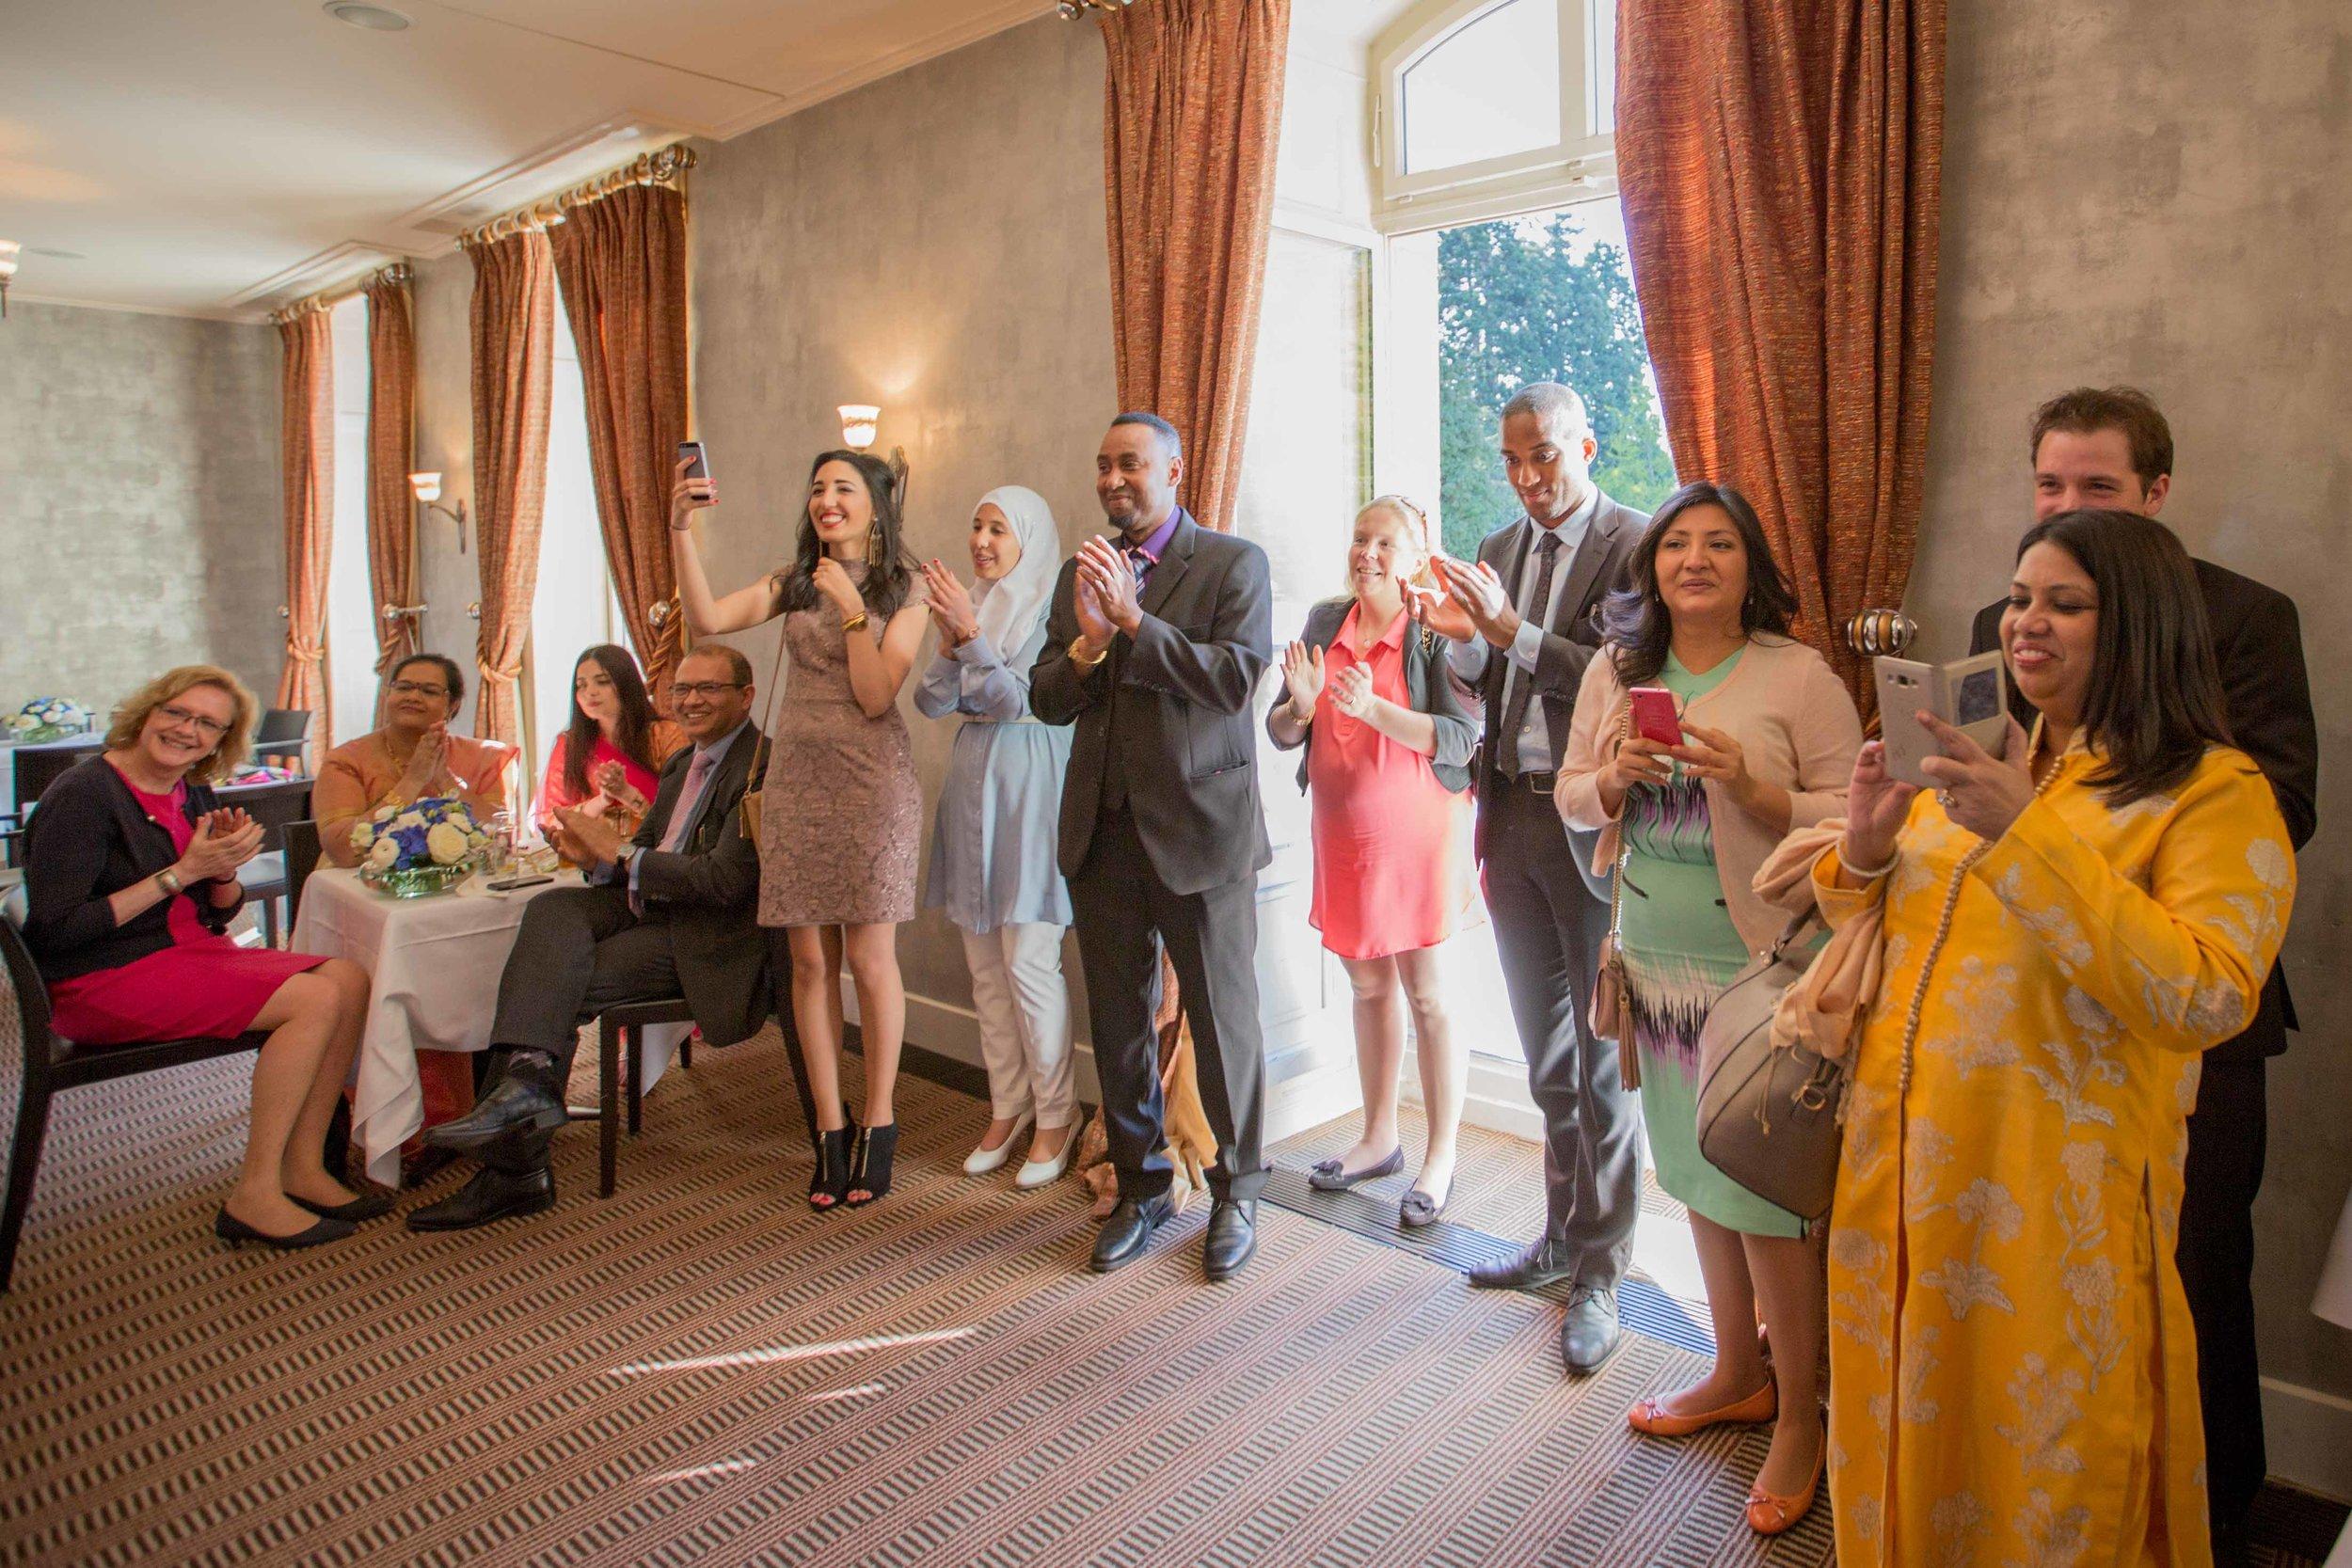 parc-des-eaux-vives-destination-wedding-photographer-geneva-switzerland-natalia-smith-photography-74.jpg